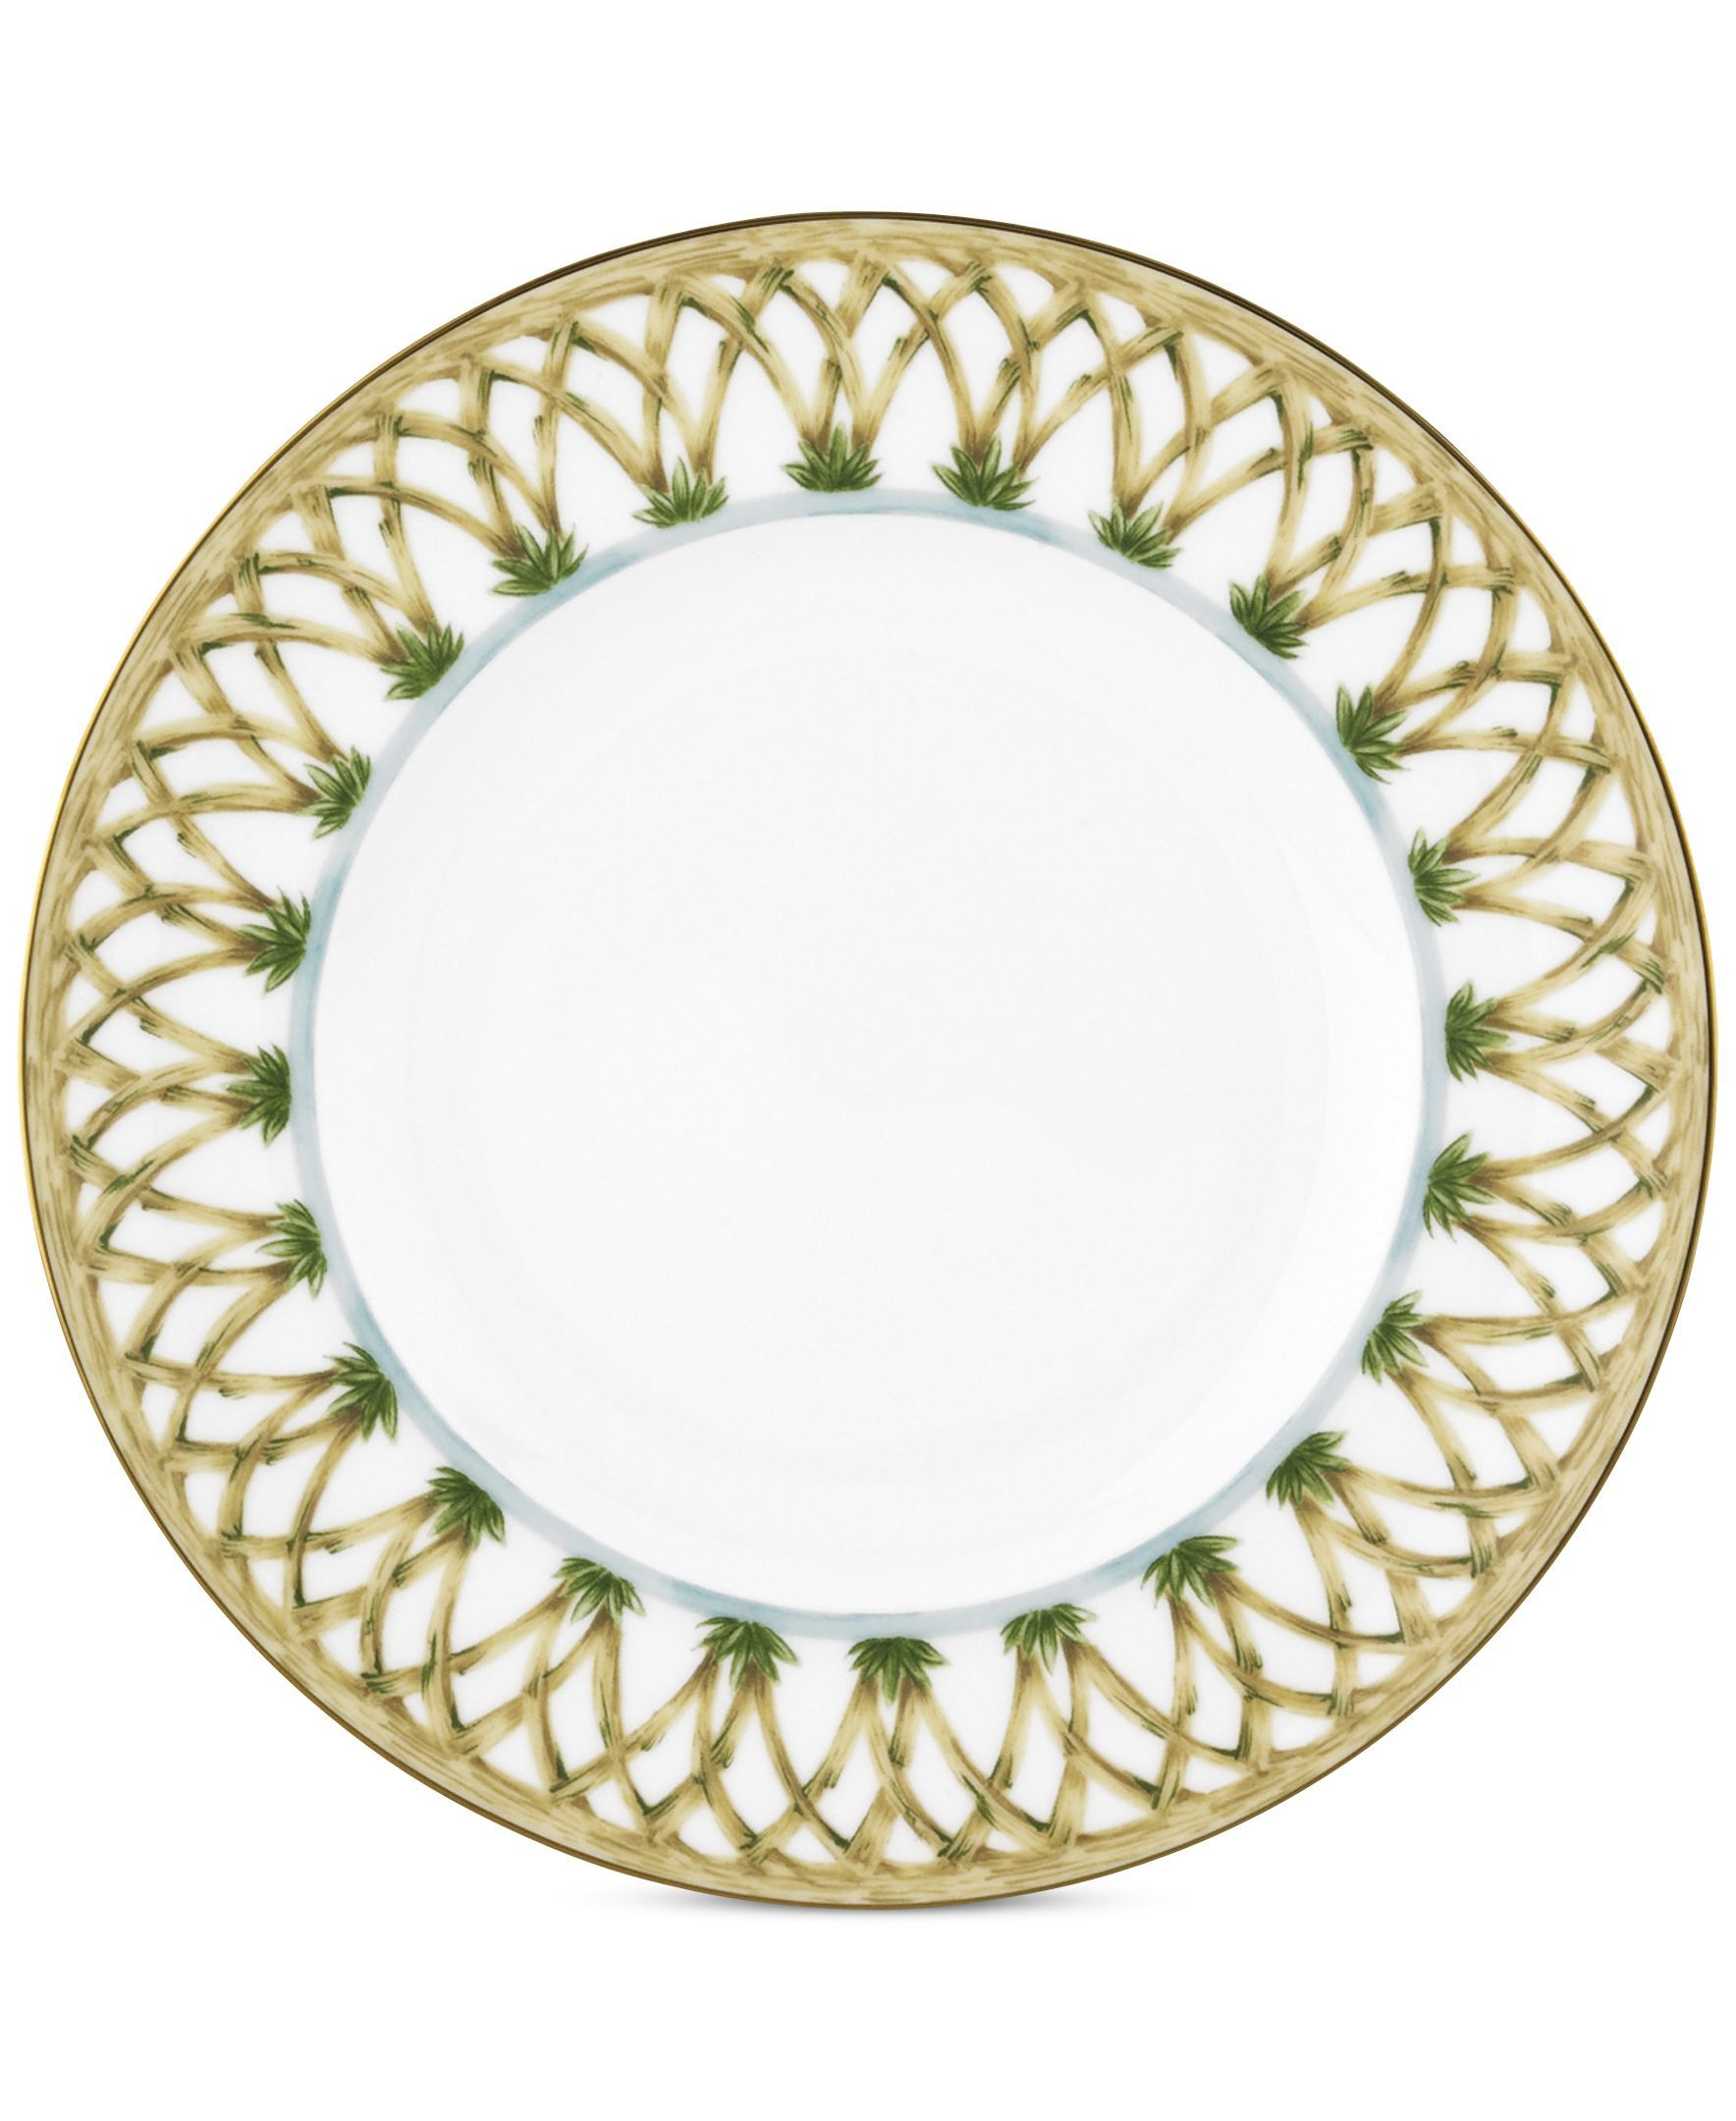 British Colonial Accent Salad Plate British Colonial British Colonial Decor Plates